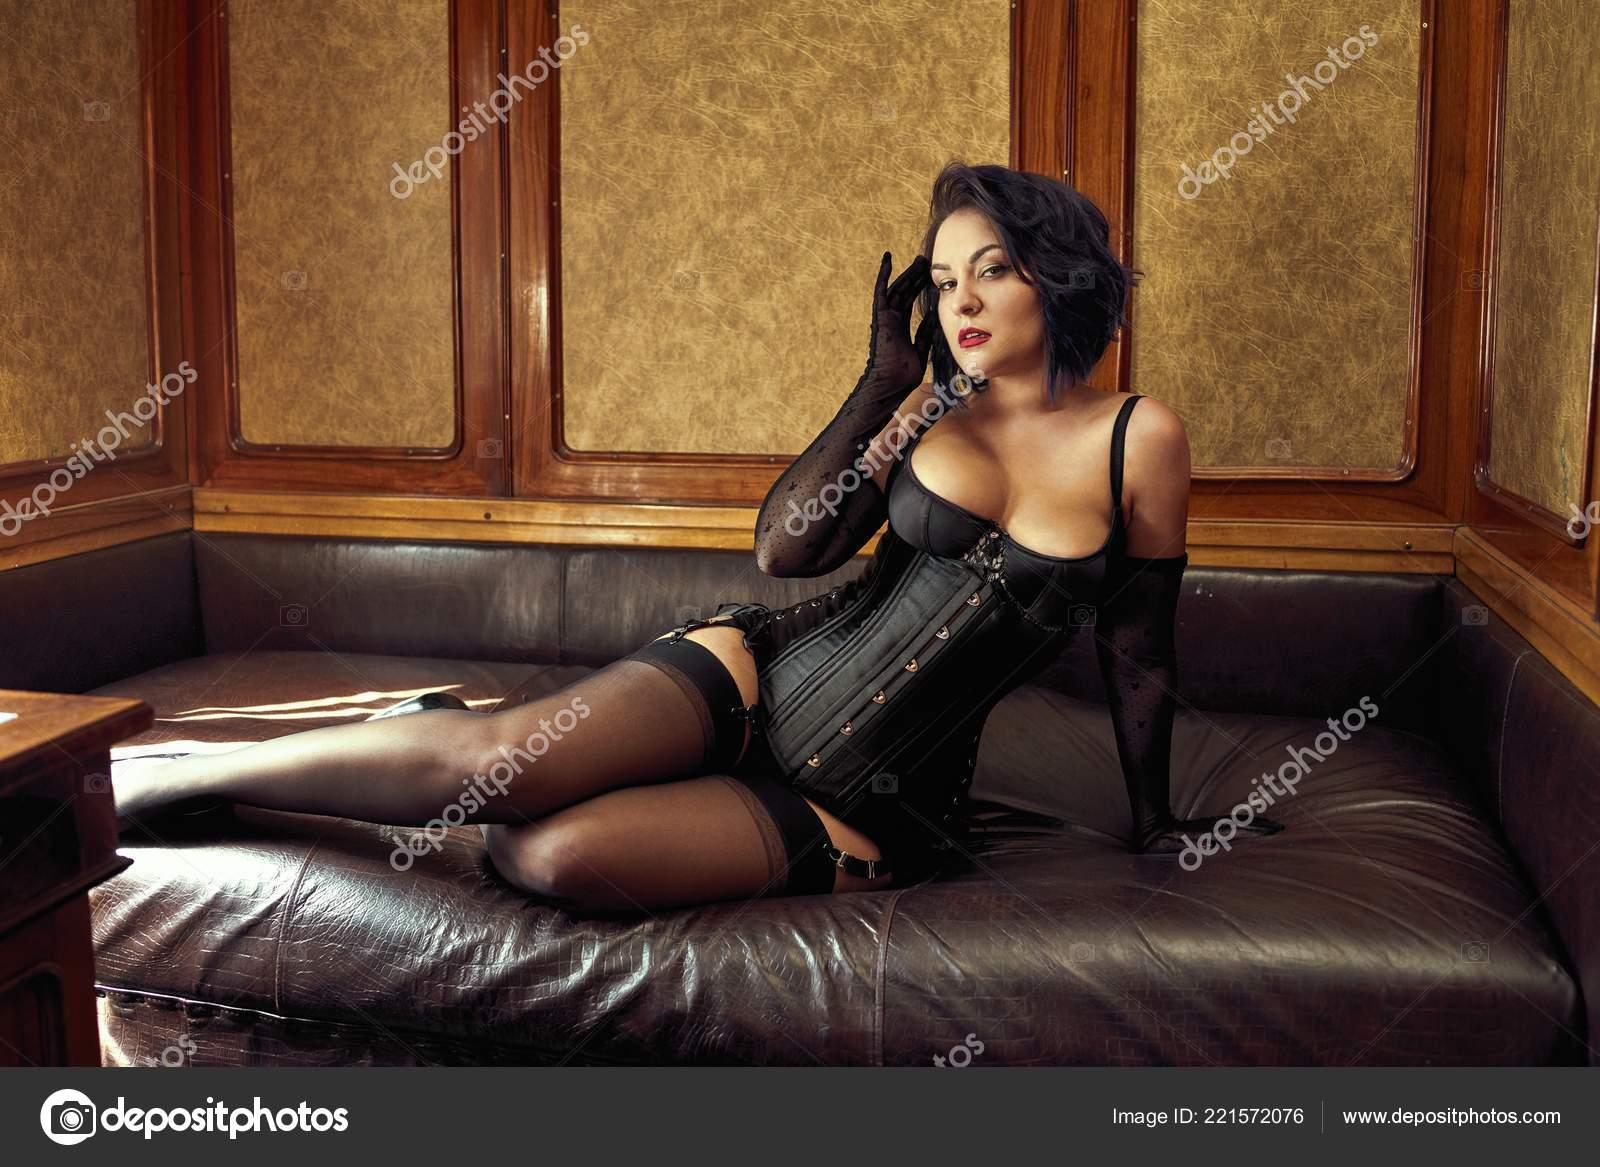 Beautiful Sexy Woman Black Lingerie Stockings Posing Indoor Stock Photo Image By C Smmartynenko 221572076